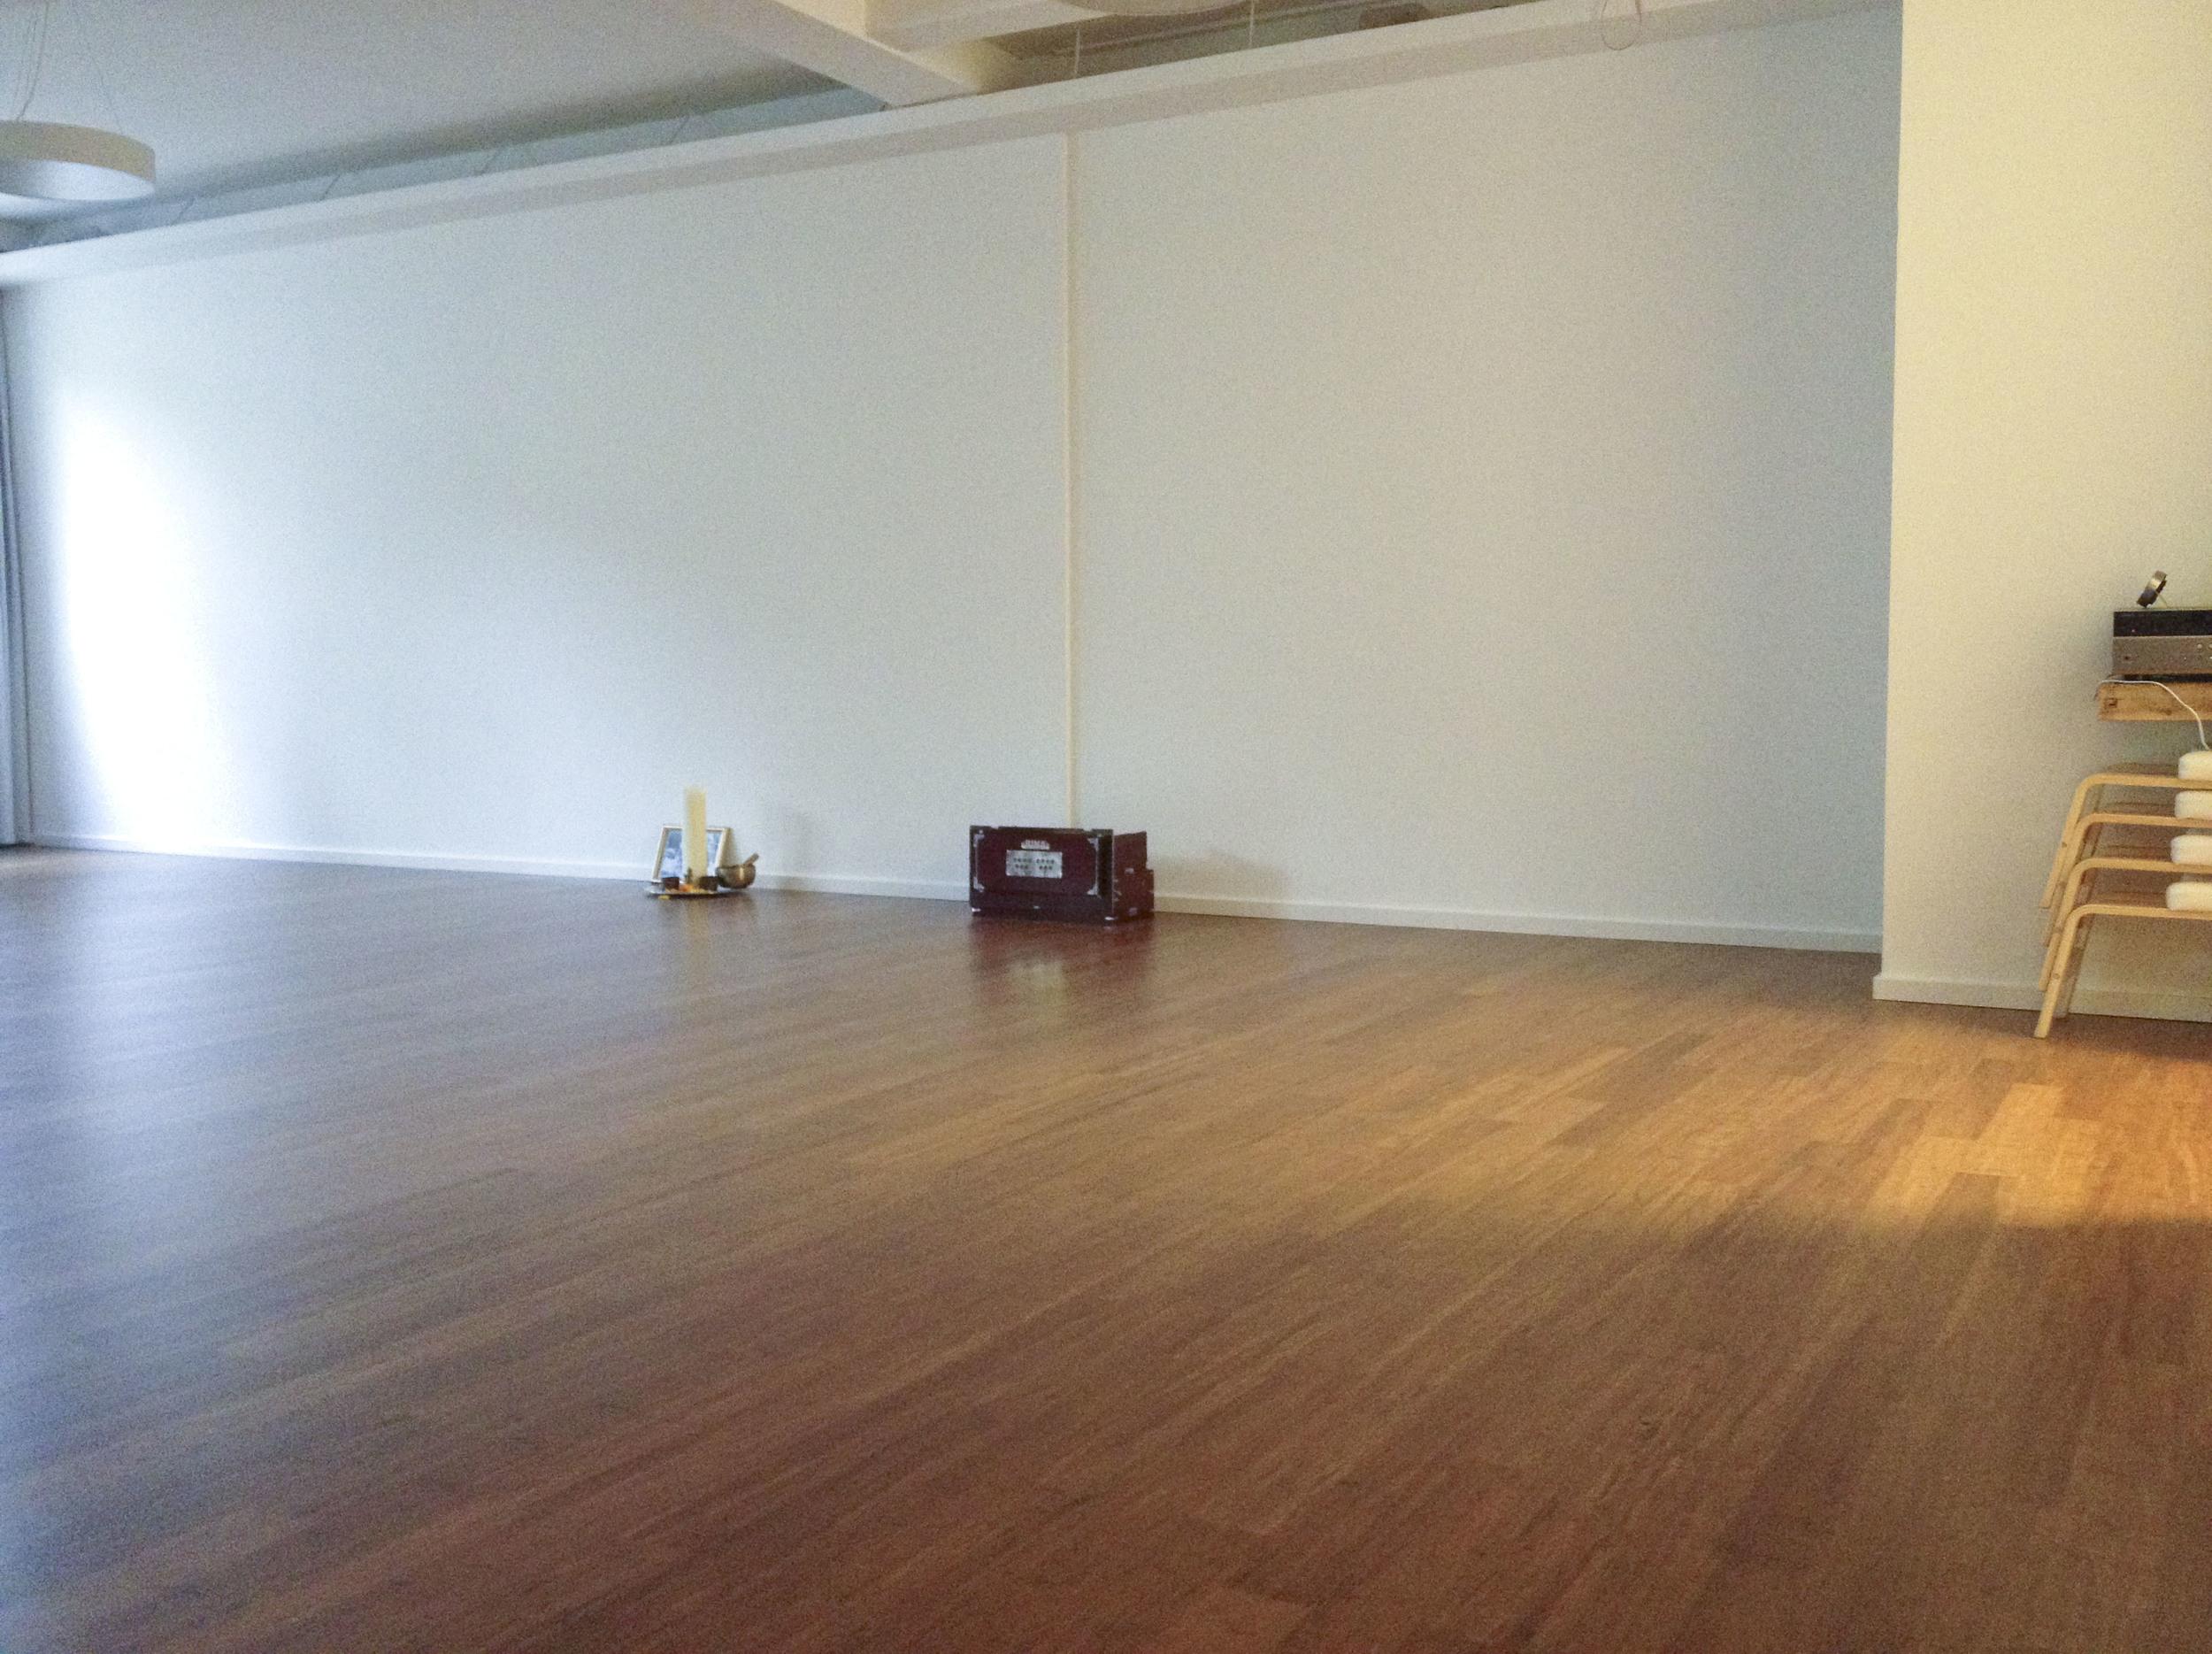 Patrick Broom Yoga, Yoga Studio, München 2177.jpg